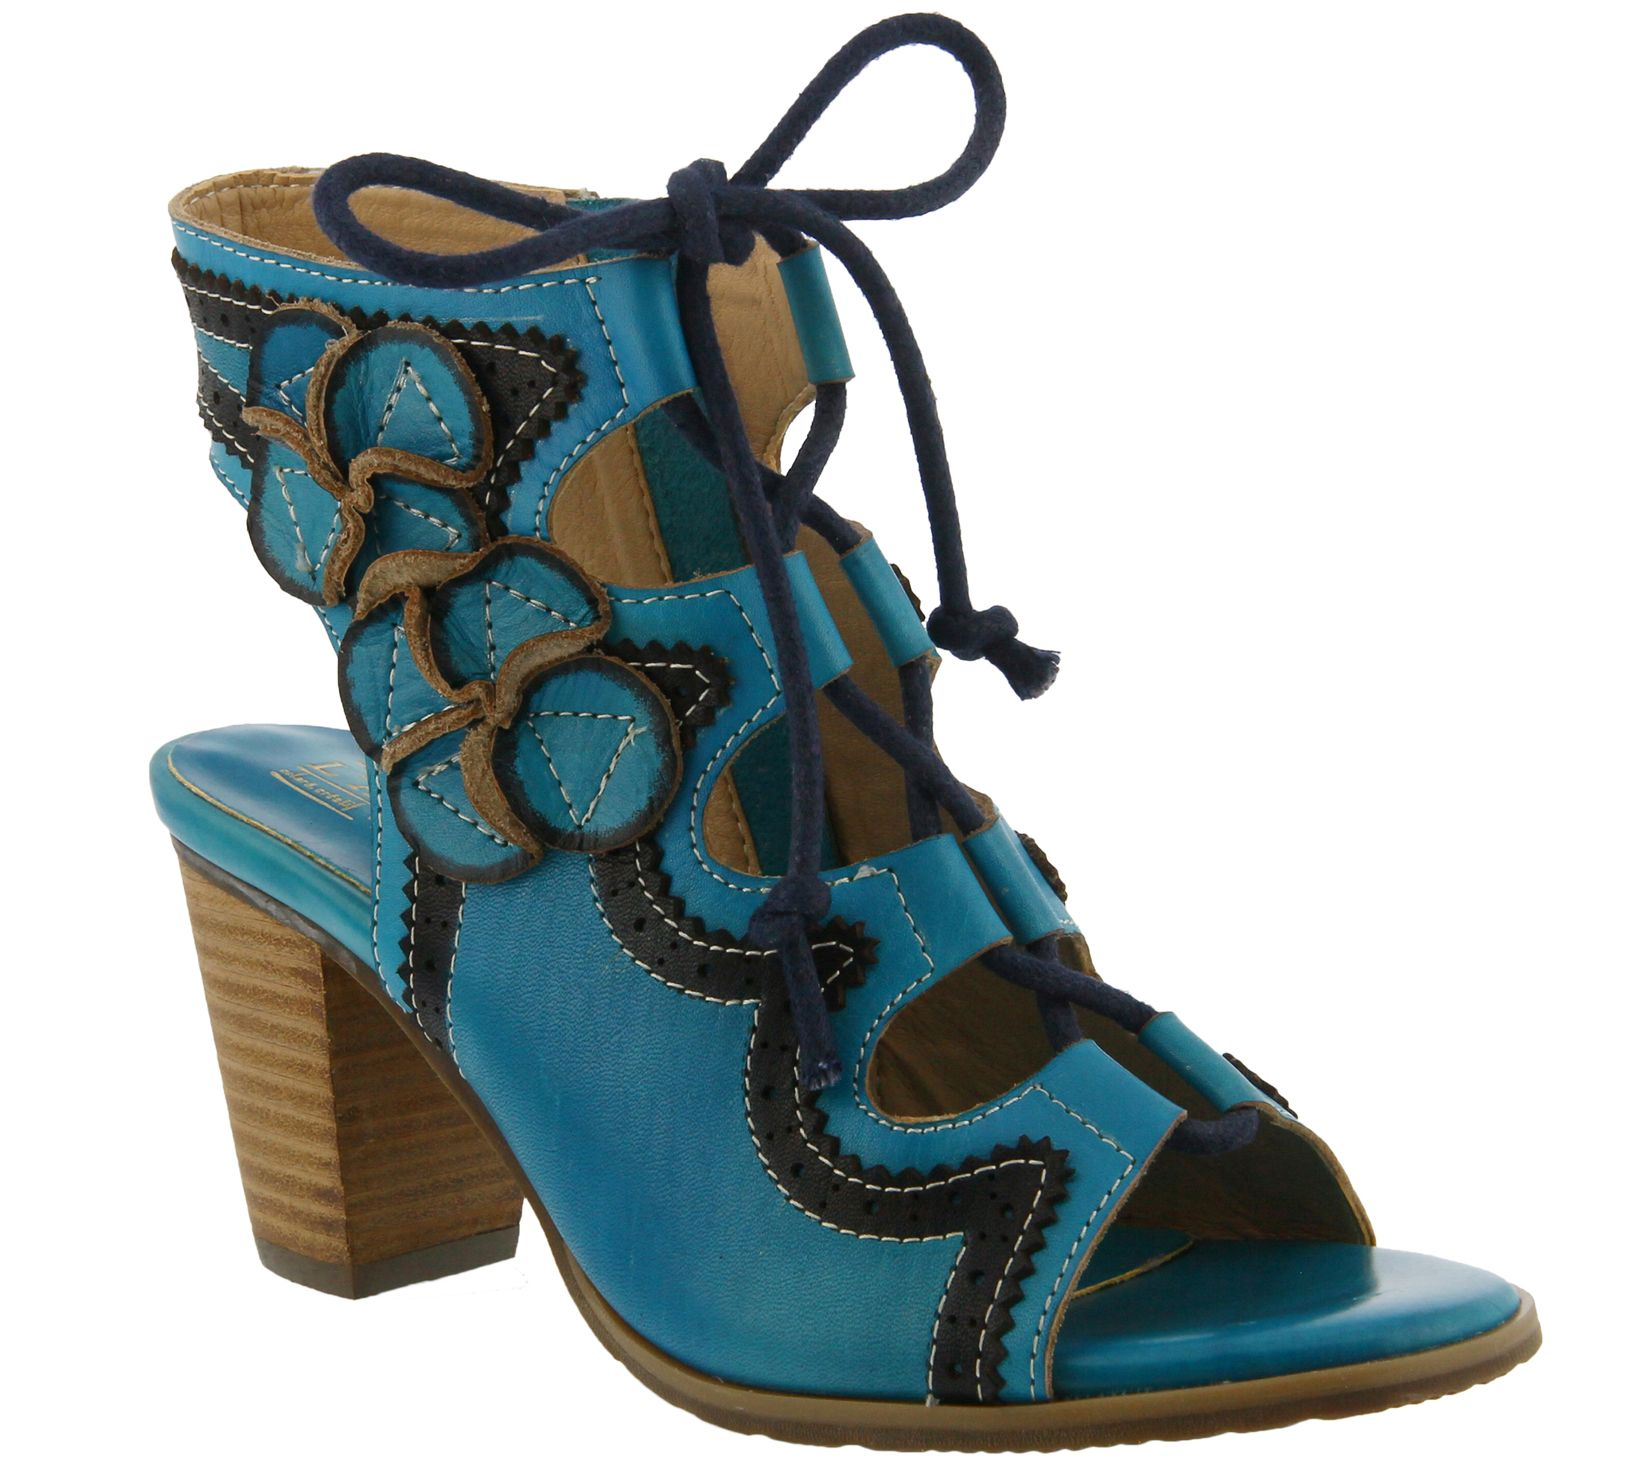 86ac2ebdd Spring Step L Artiste Leather Sandals - Alejandra - Page 1 — QVC.com